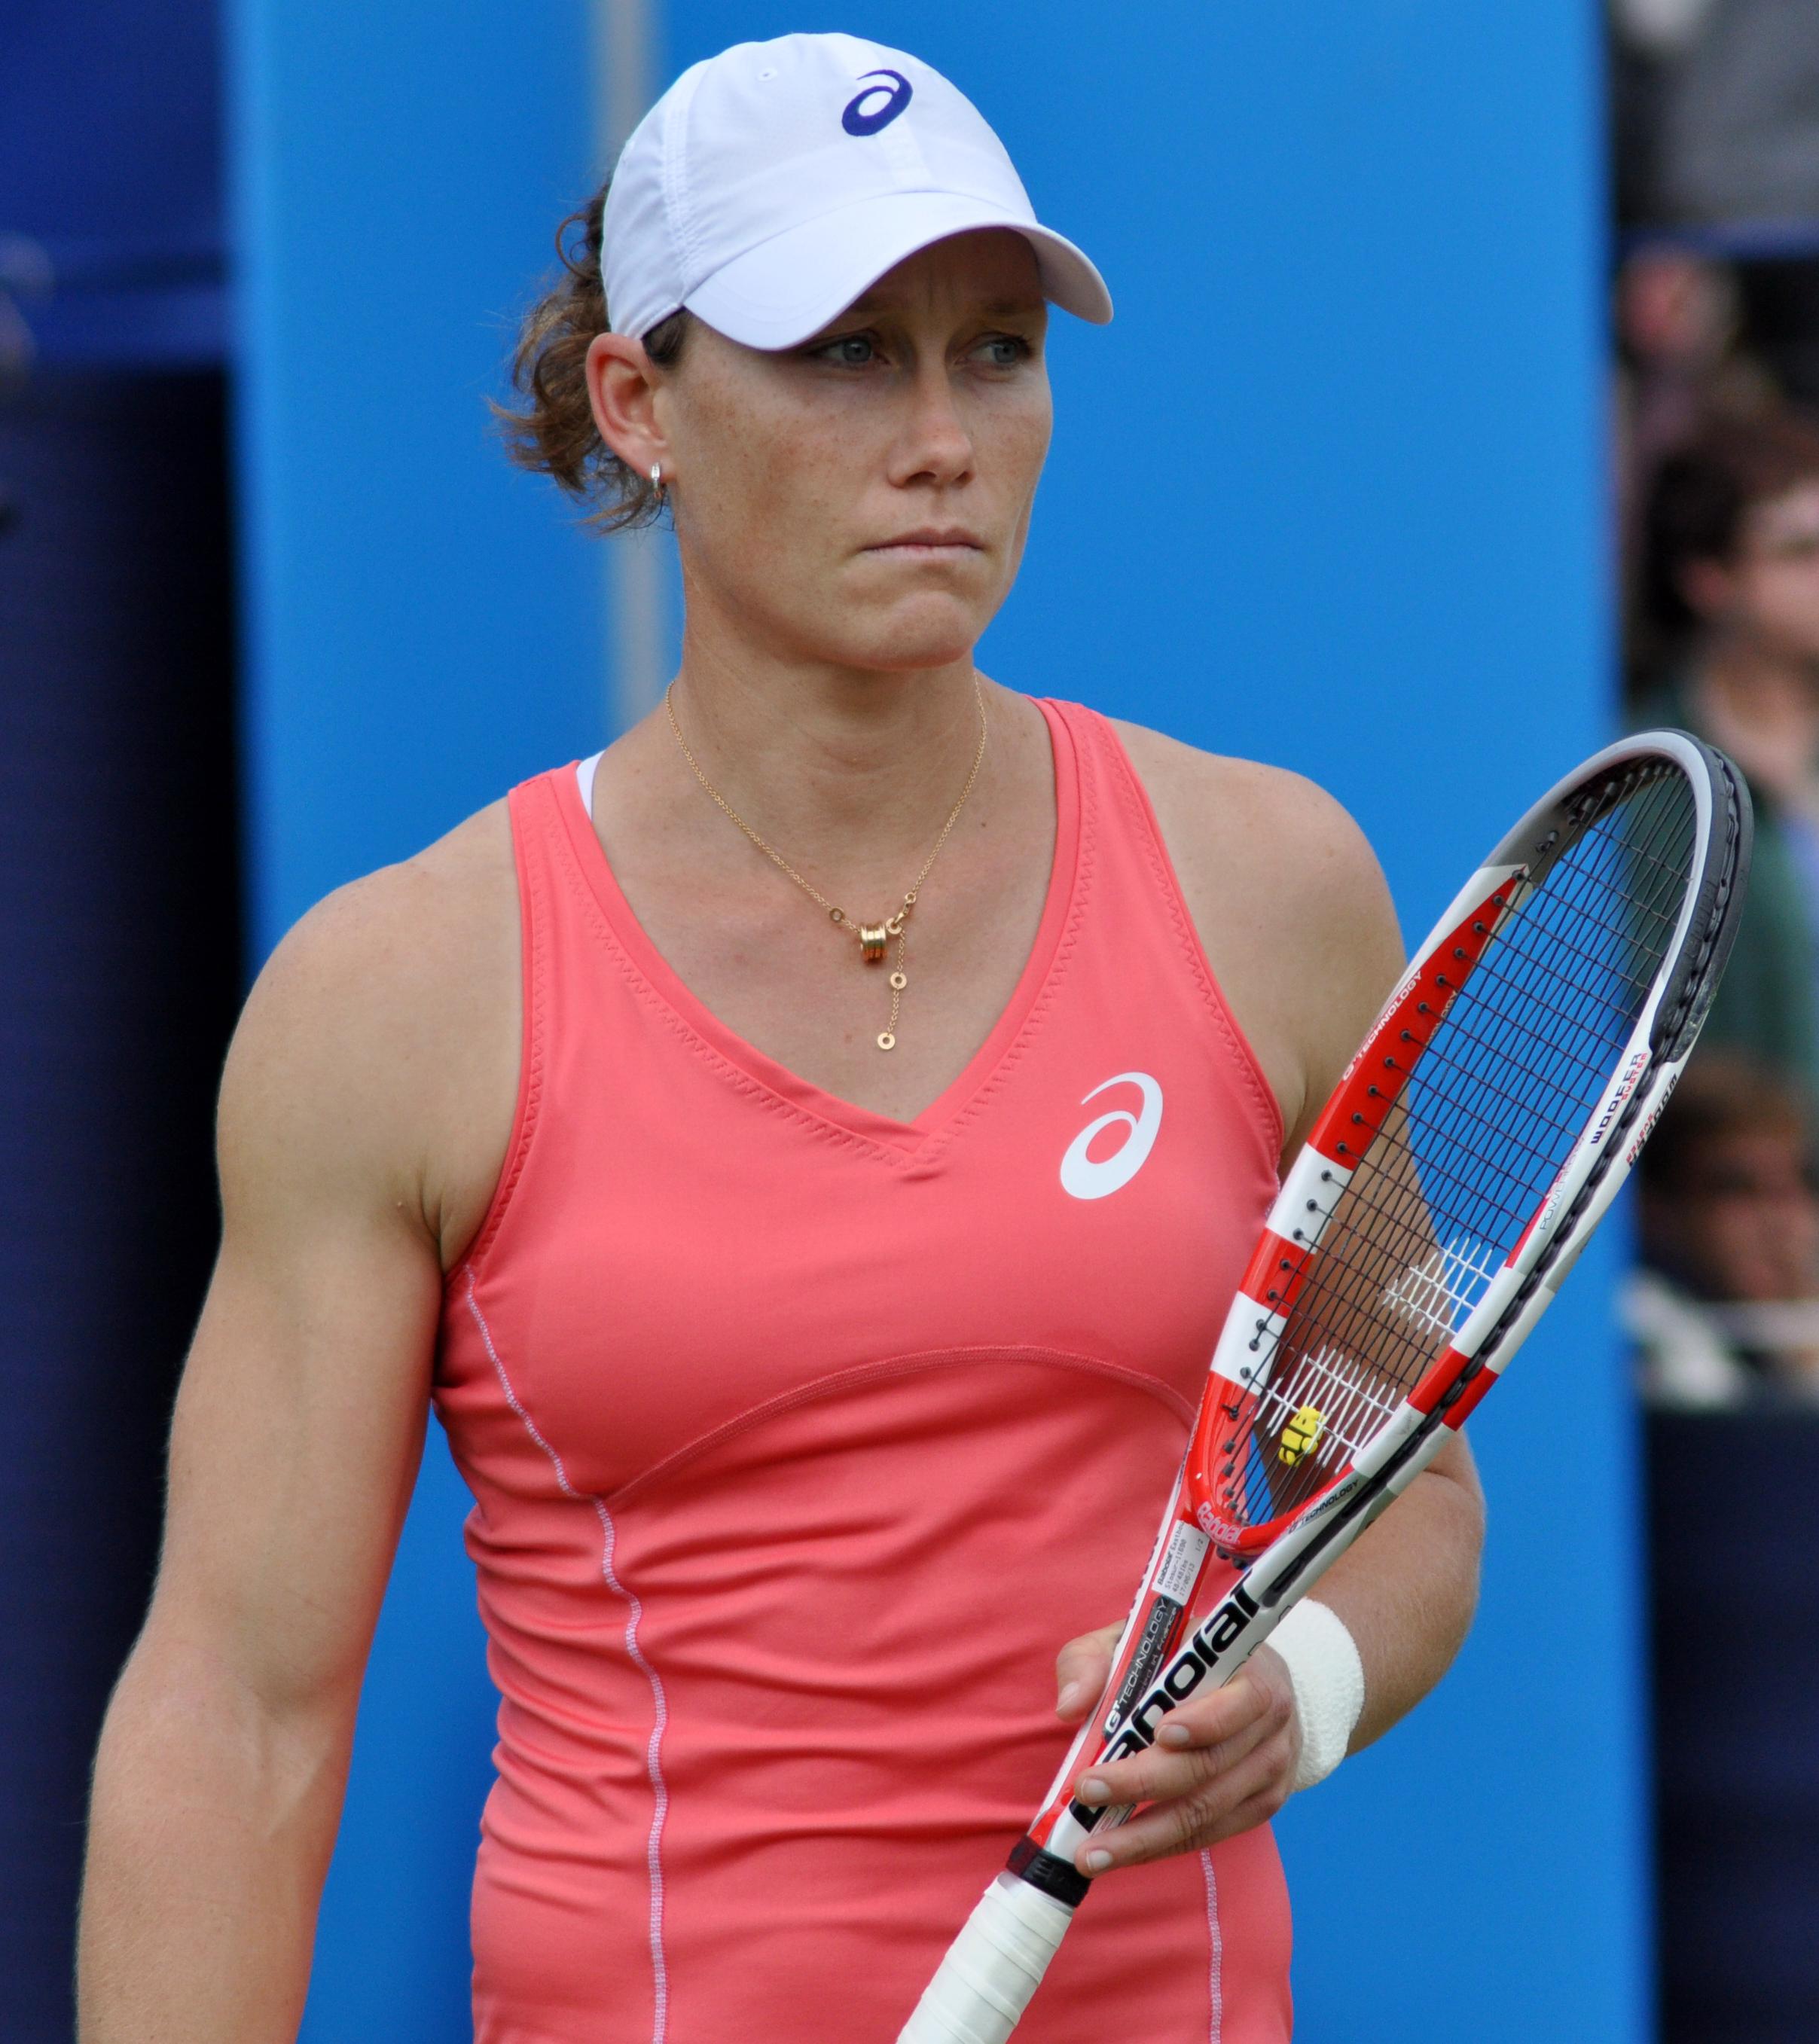 Wta: WTA Charleston: Preview And Predictions